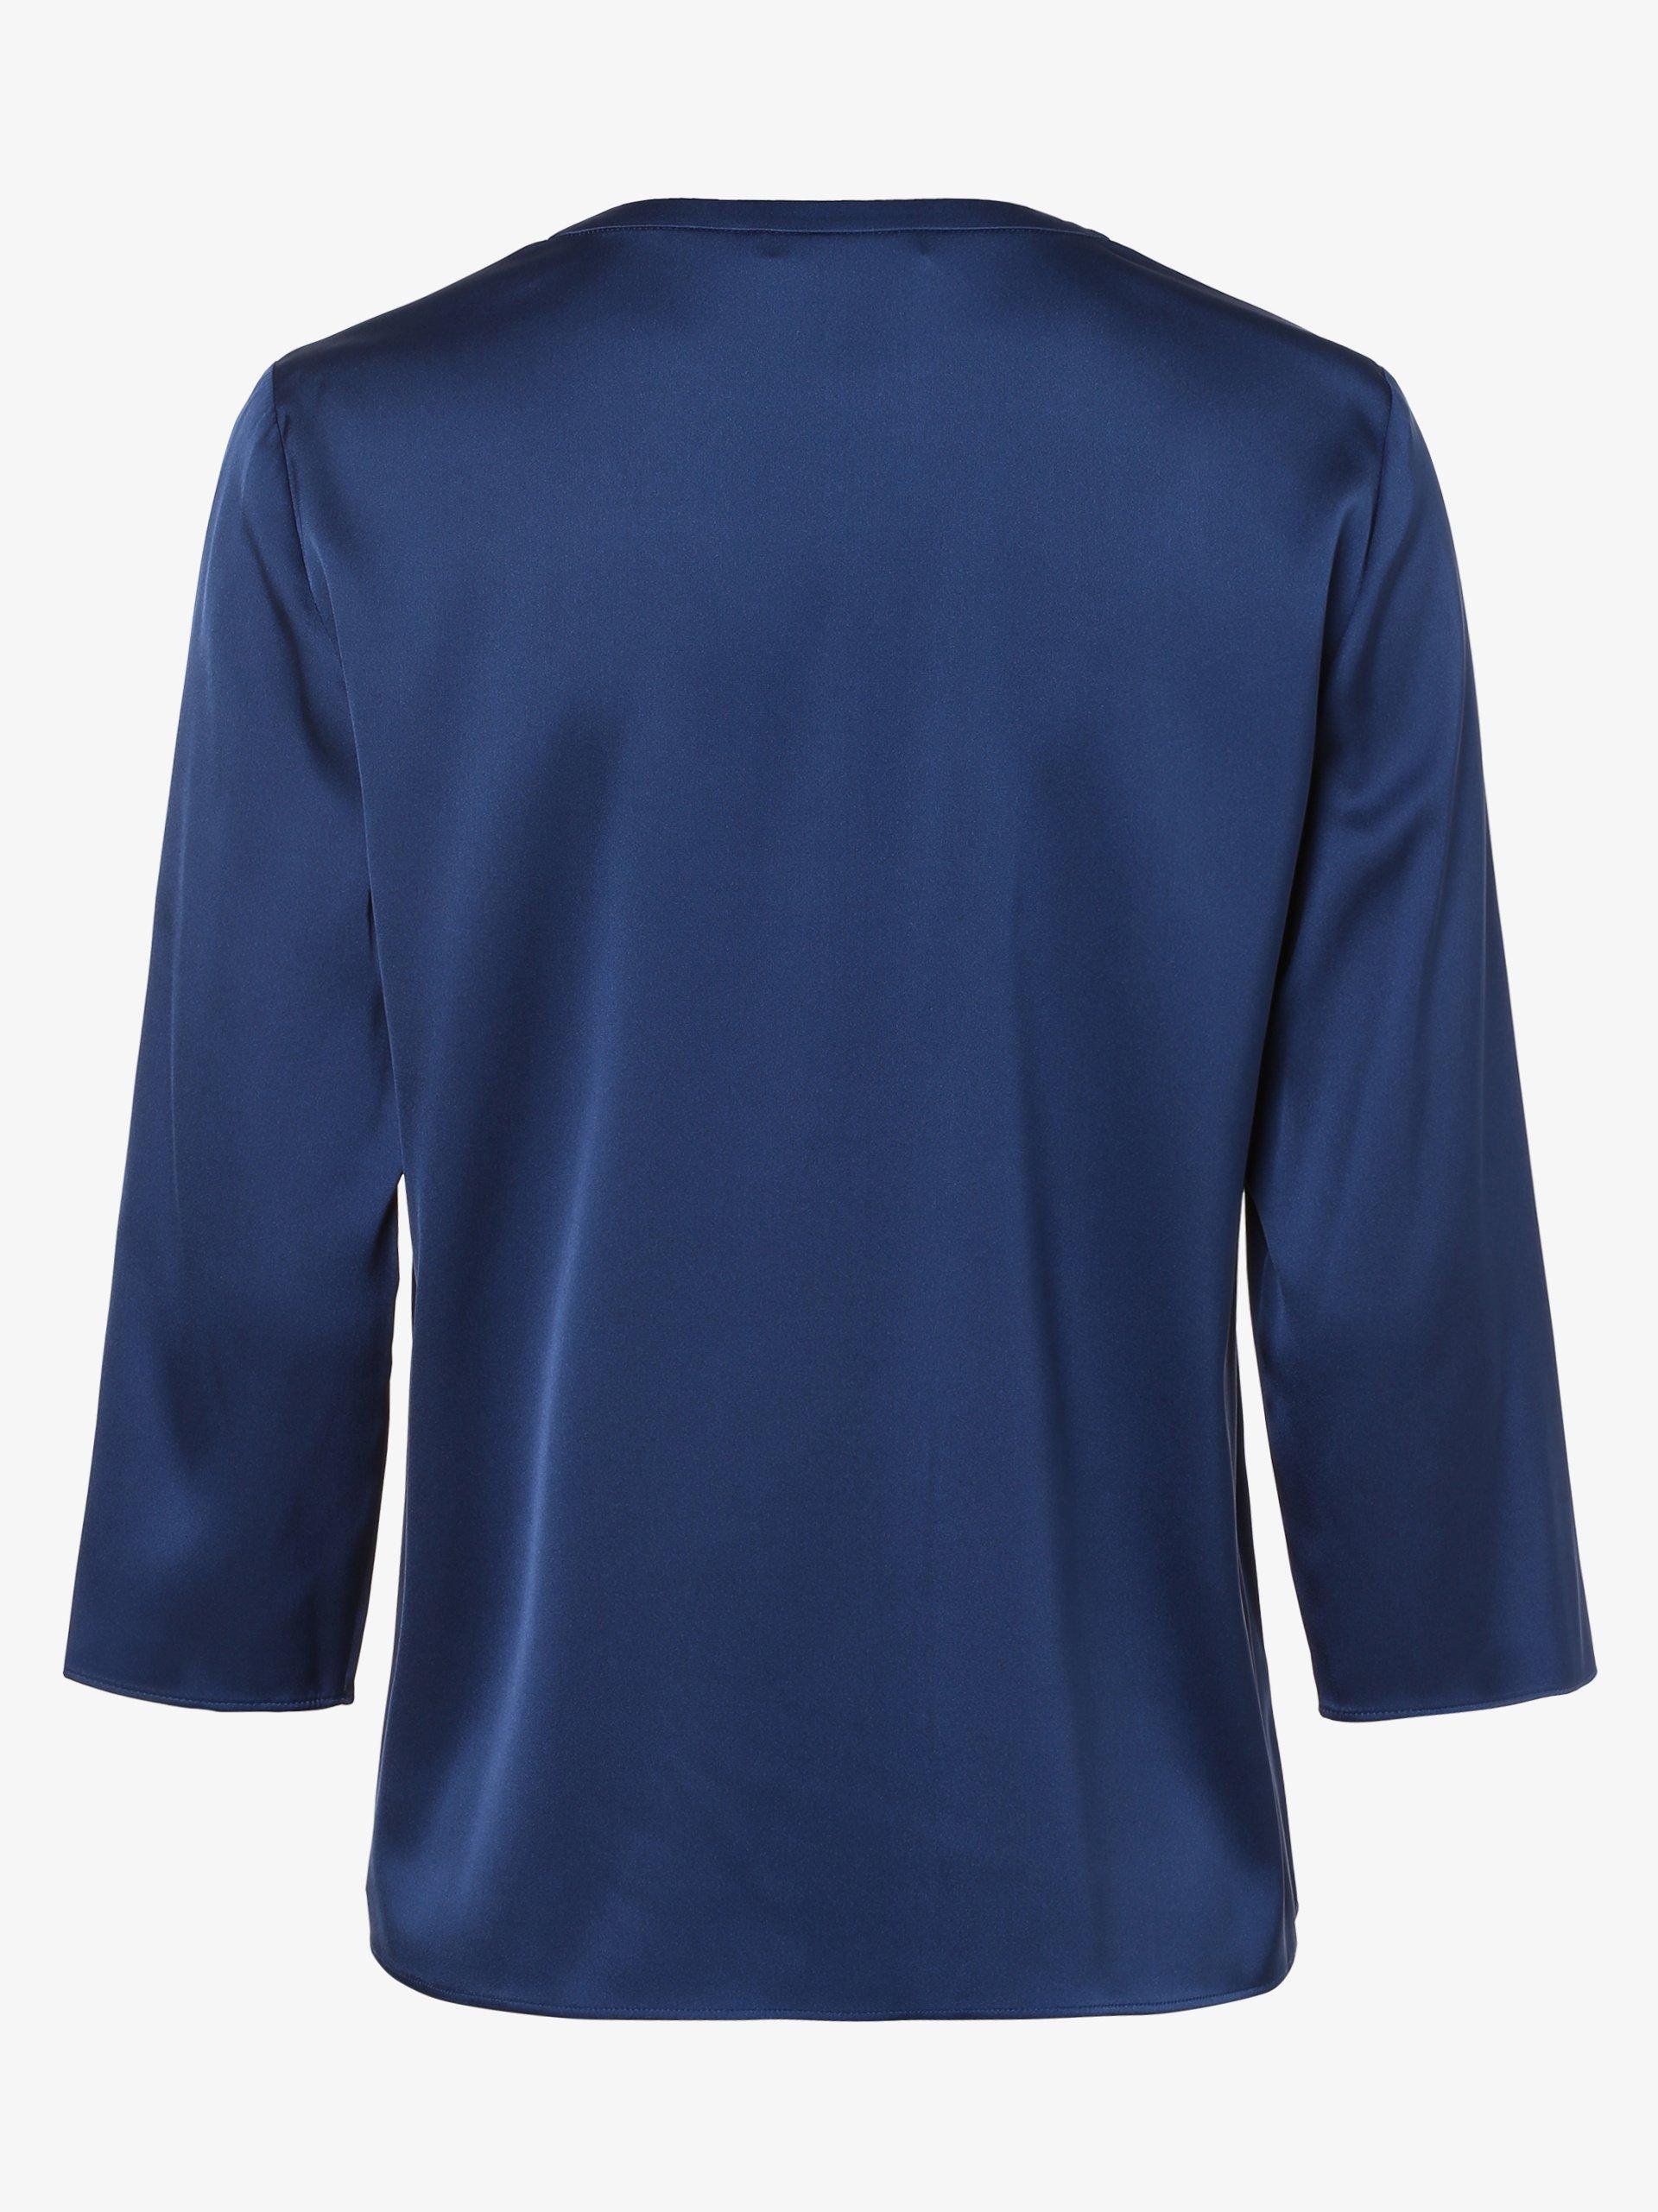 HUGO Damen Bluse aus Seiden-Mix - Casalis-1